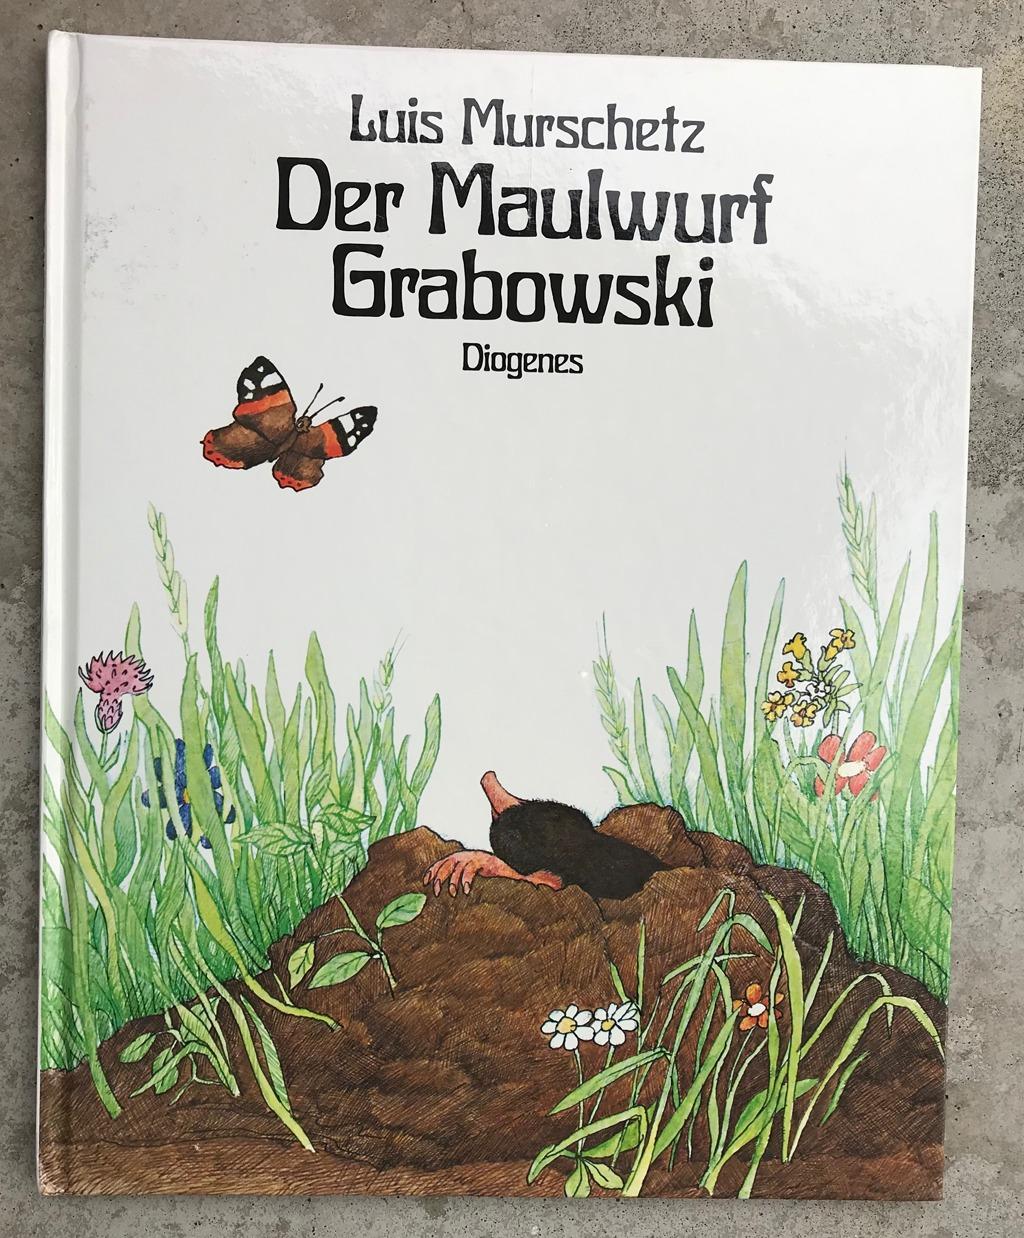 der maulwurf grabowski 1